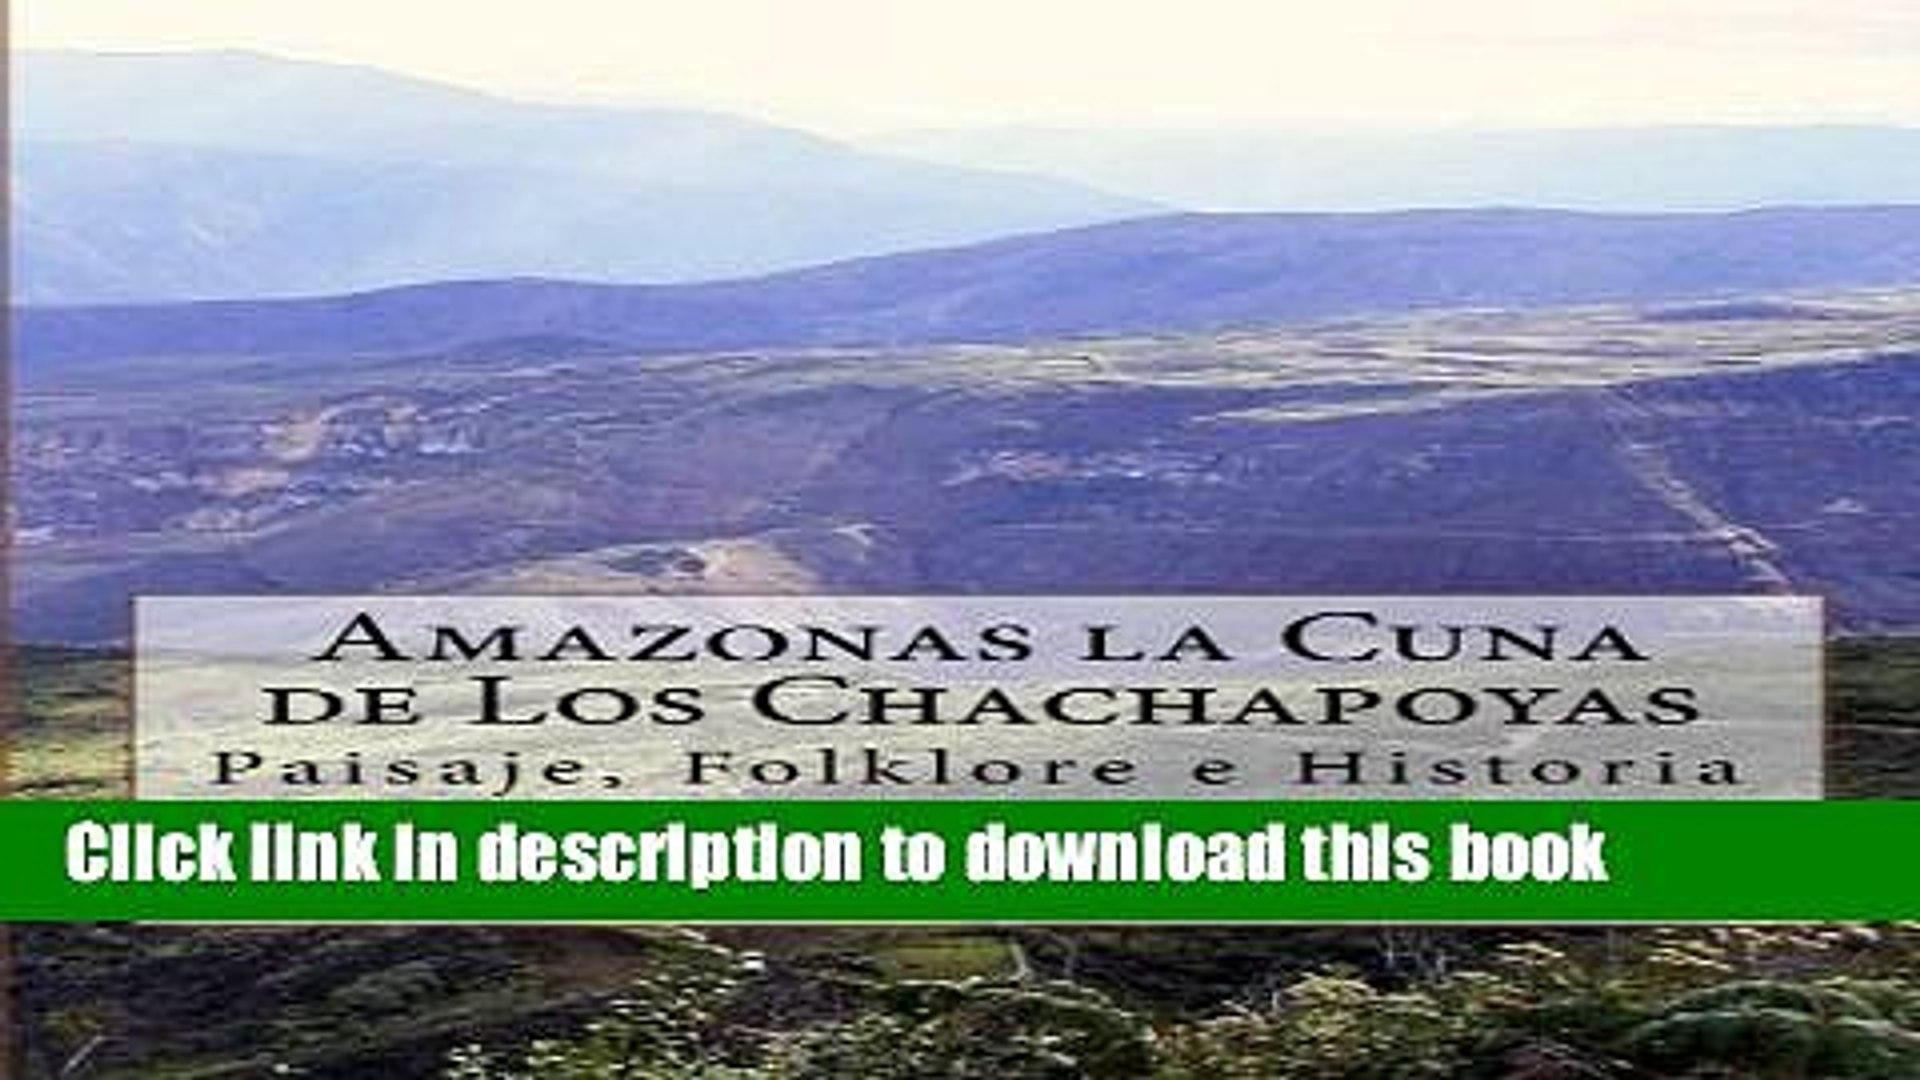 [Read PDF] Amazonas la Cuna de Los Chachapoyas: Paisaje, Folklore e Historia (Spanish Edition)